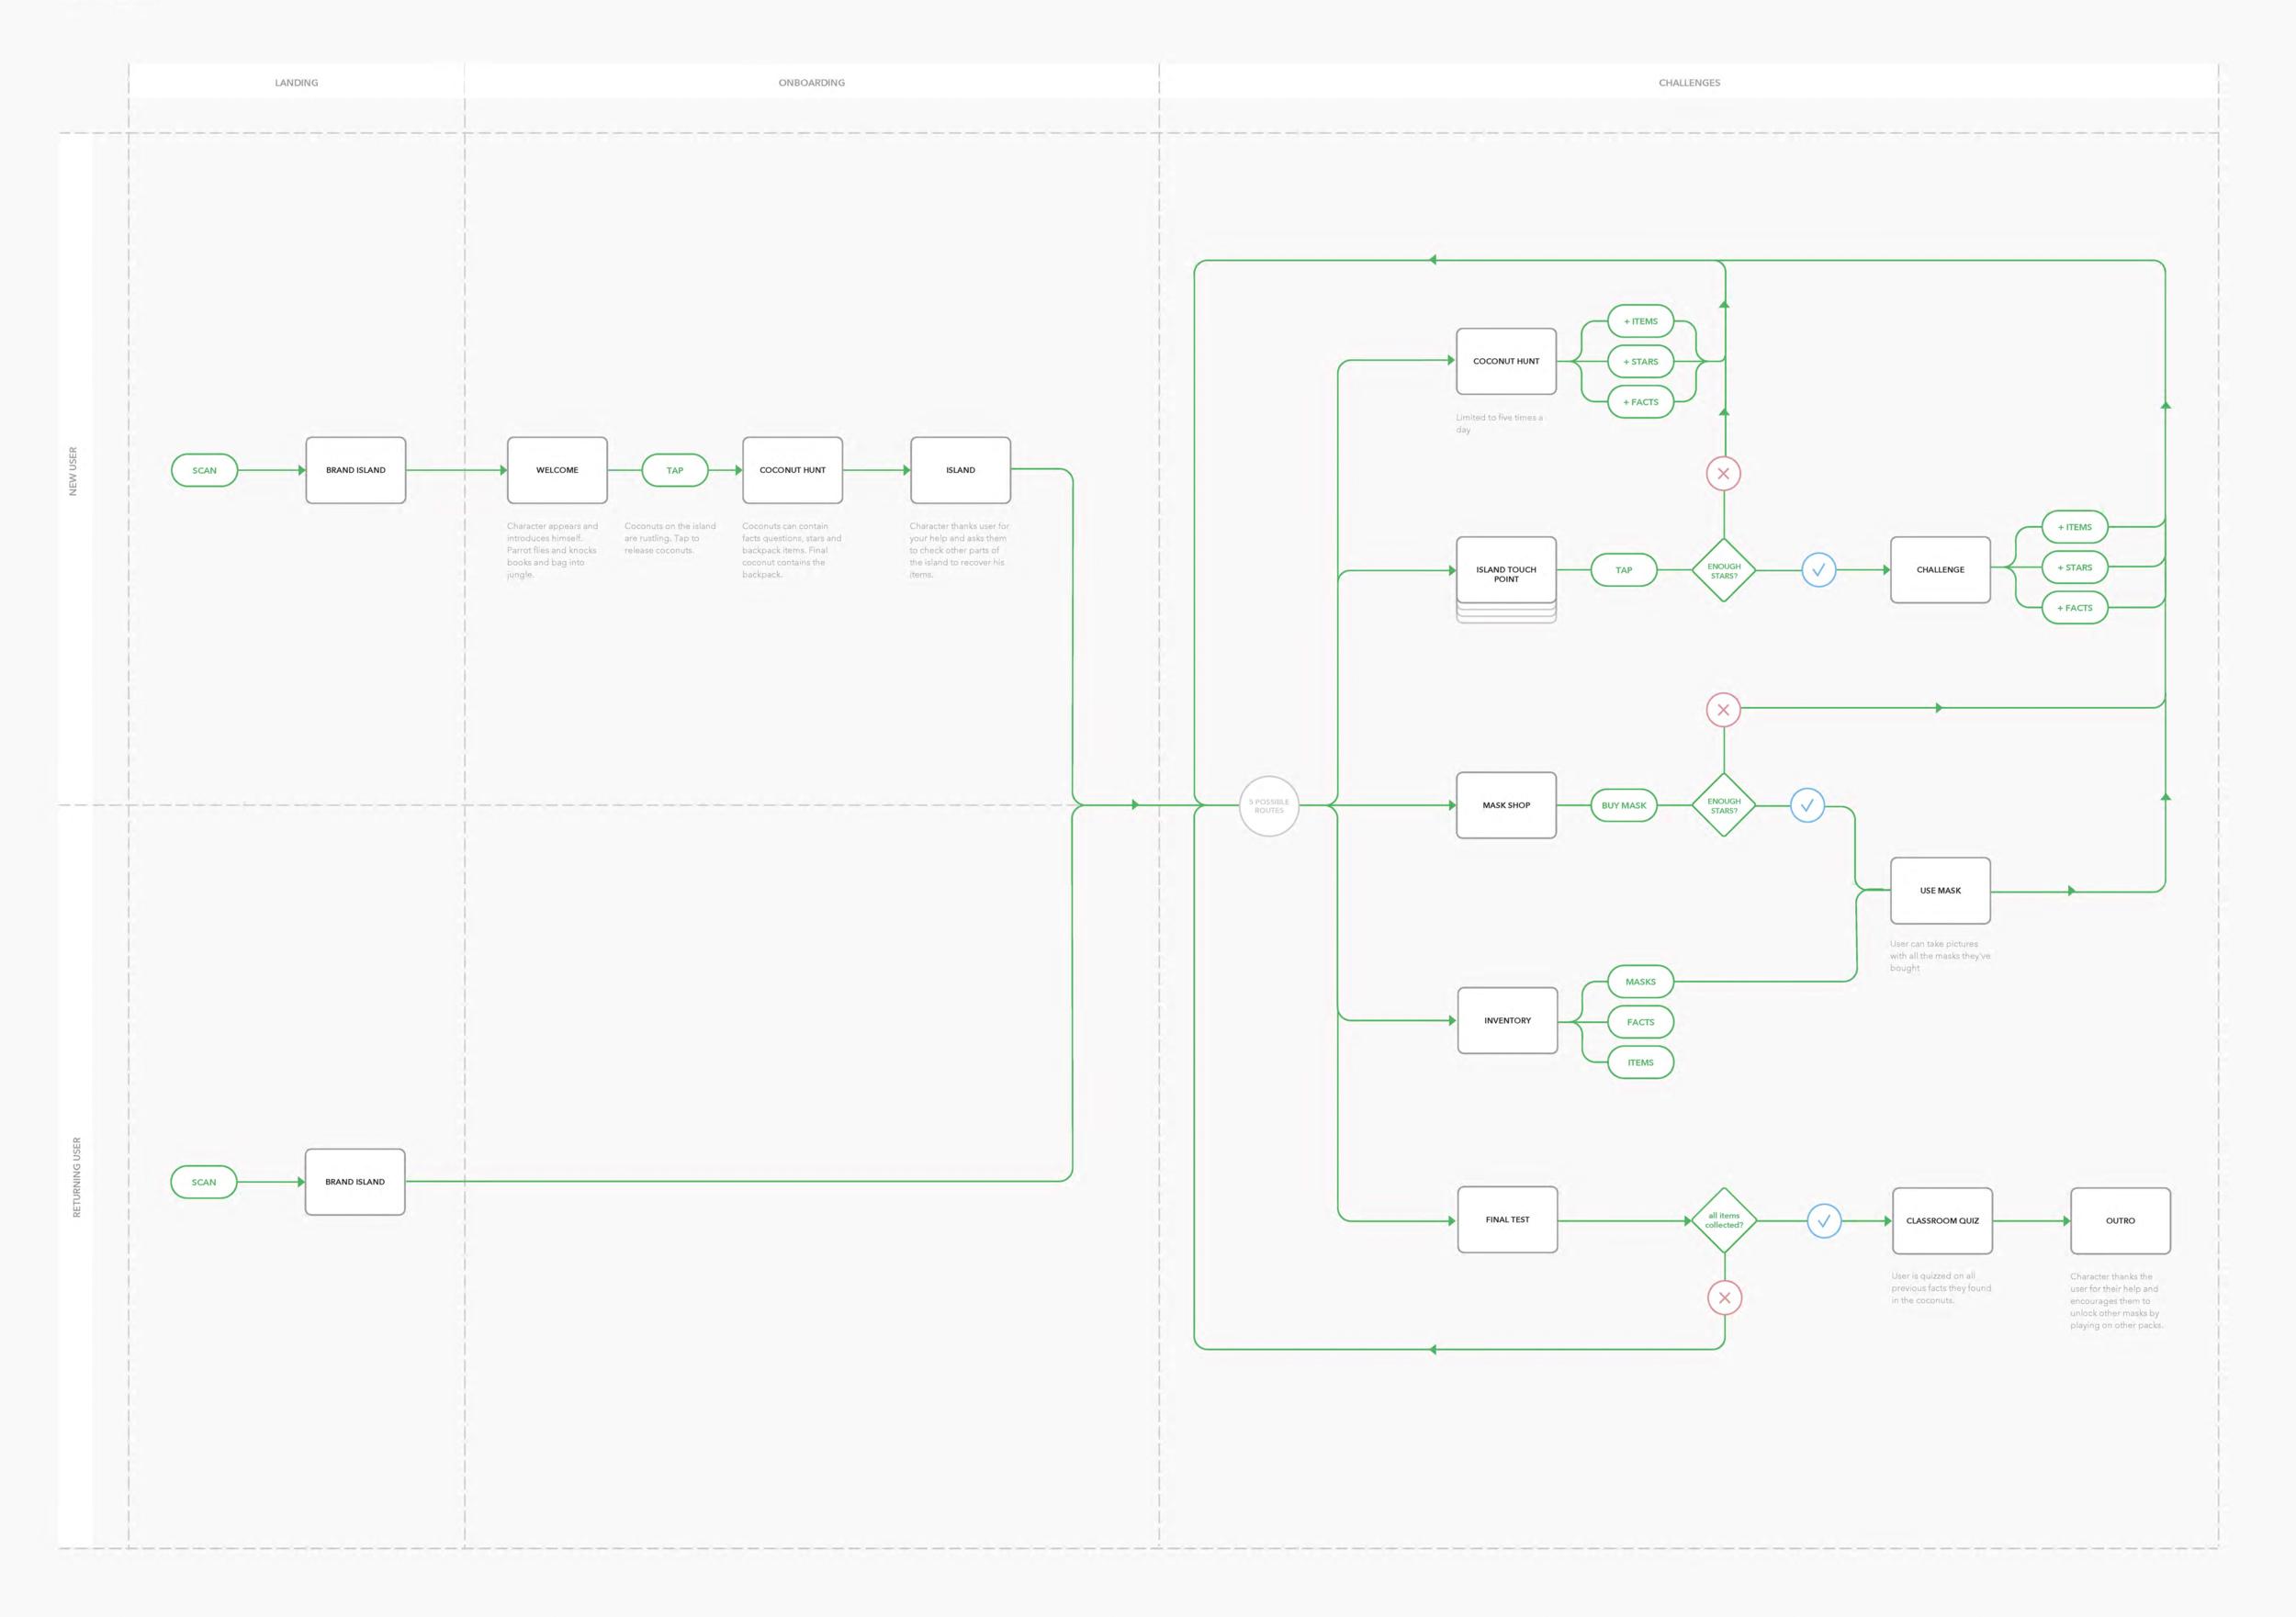 flow diagram showing the proposed journey mechanics